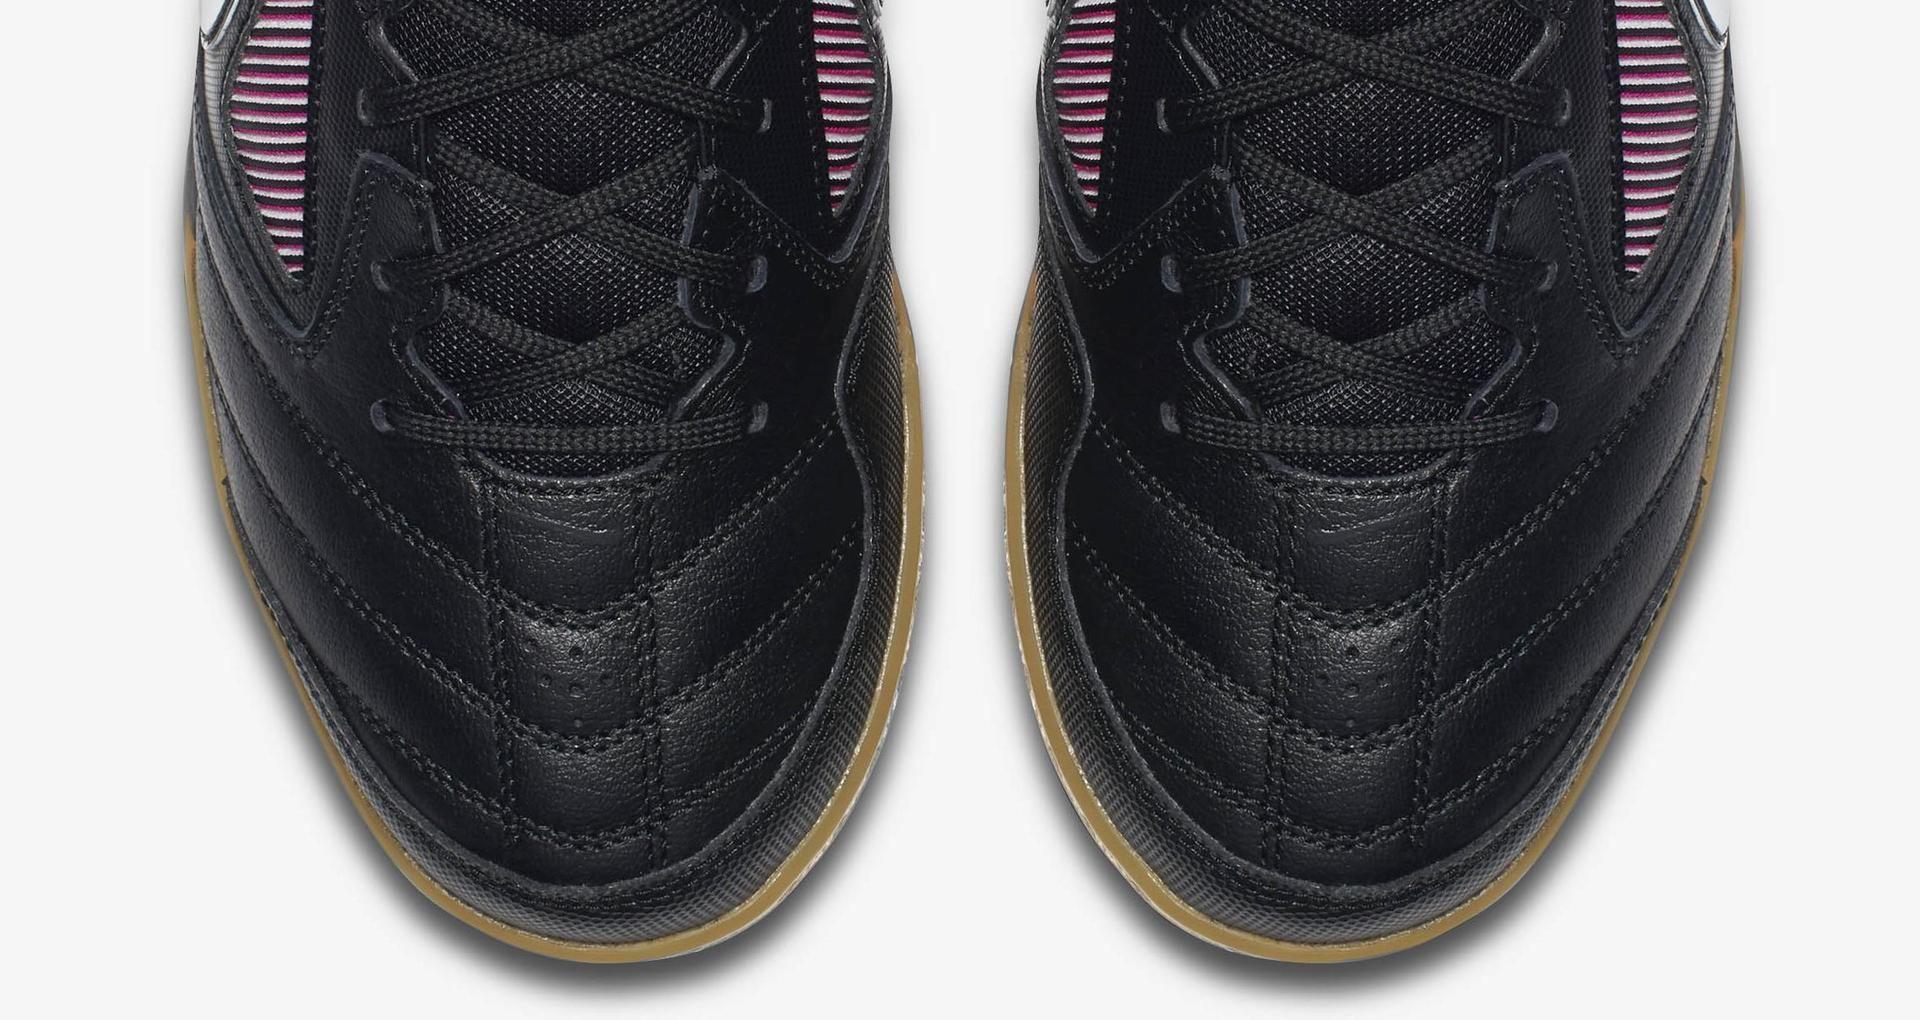 huge discount fb894 25bbf Nike Sb Gato Qs Supreme  Black   White   Spirit Teal  Release Date